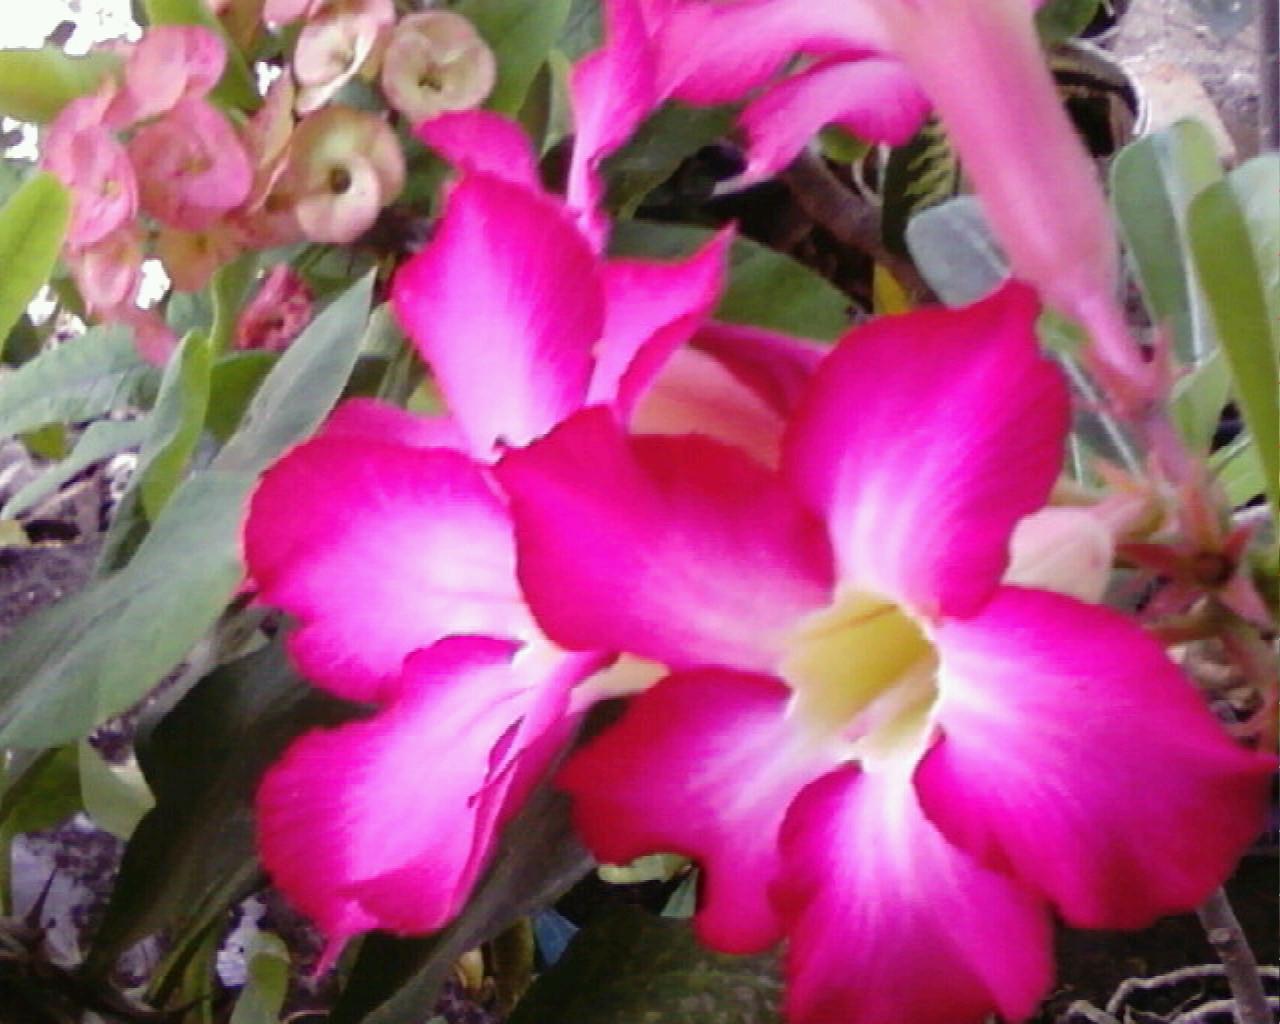 bunga kamboja bunga tropis yang satu ini memang elok dipandang kuntum